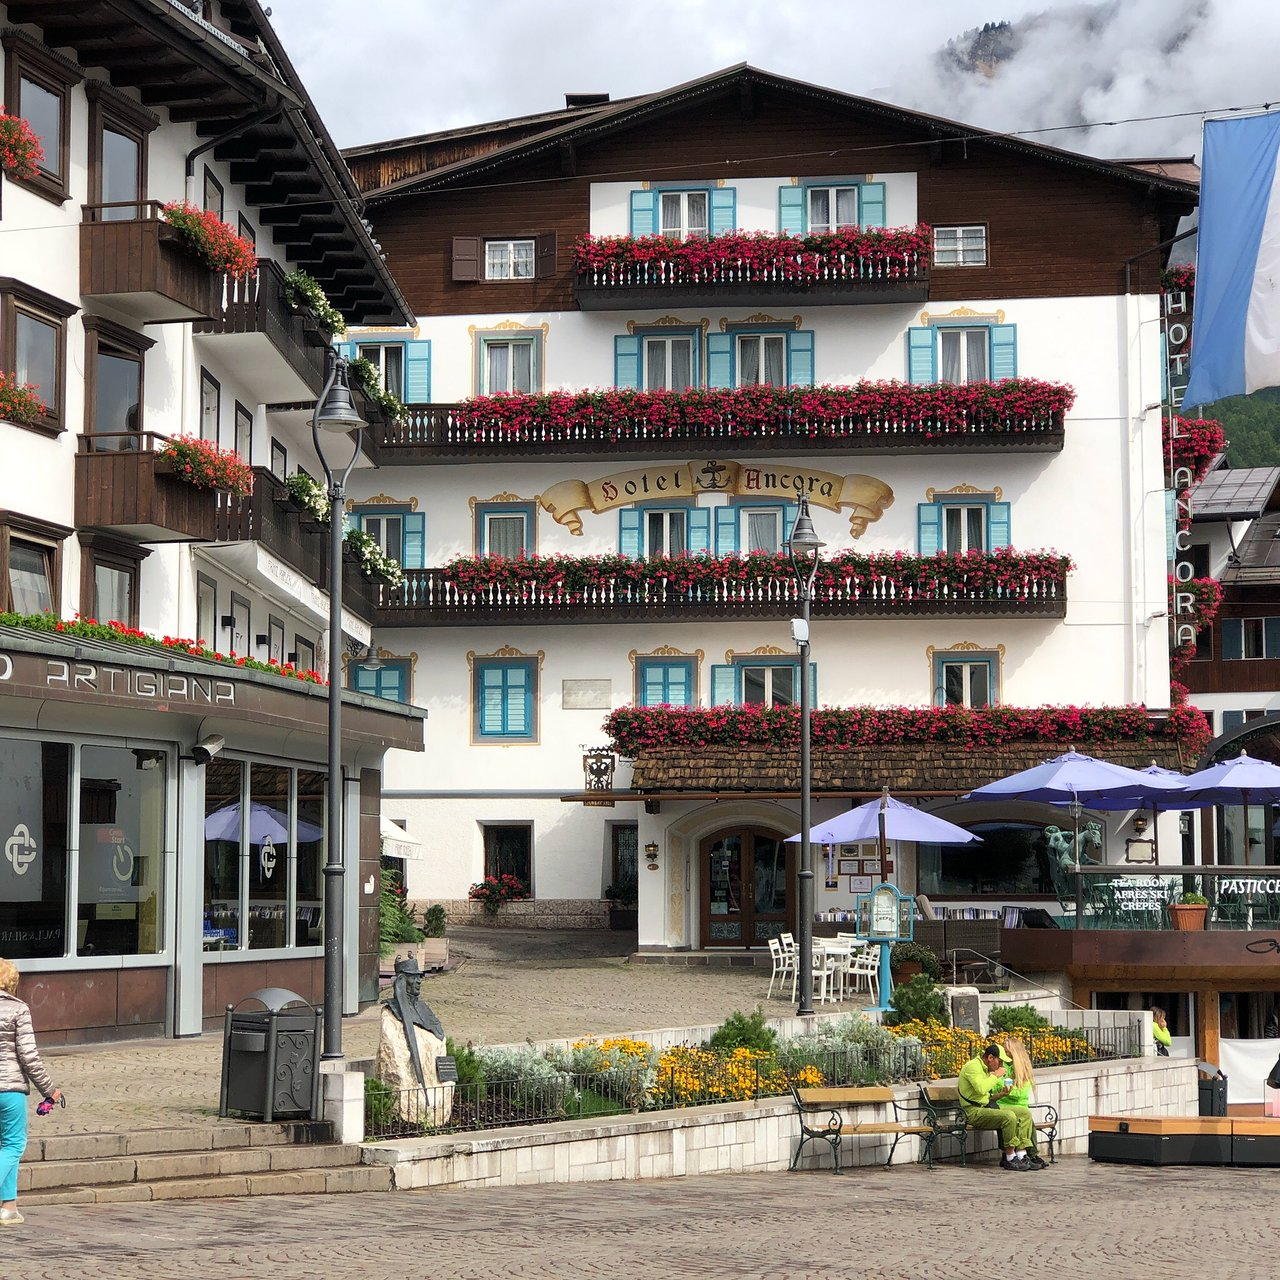 Air Service Center Cortina.Hotel Alaska Cortina Updated 2019 Prices Reviews Italy